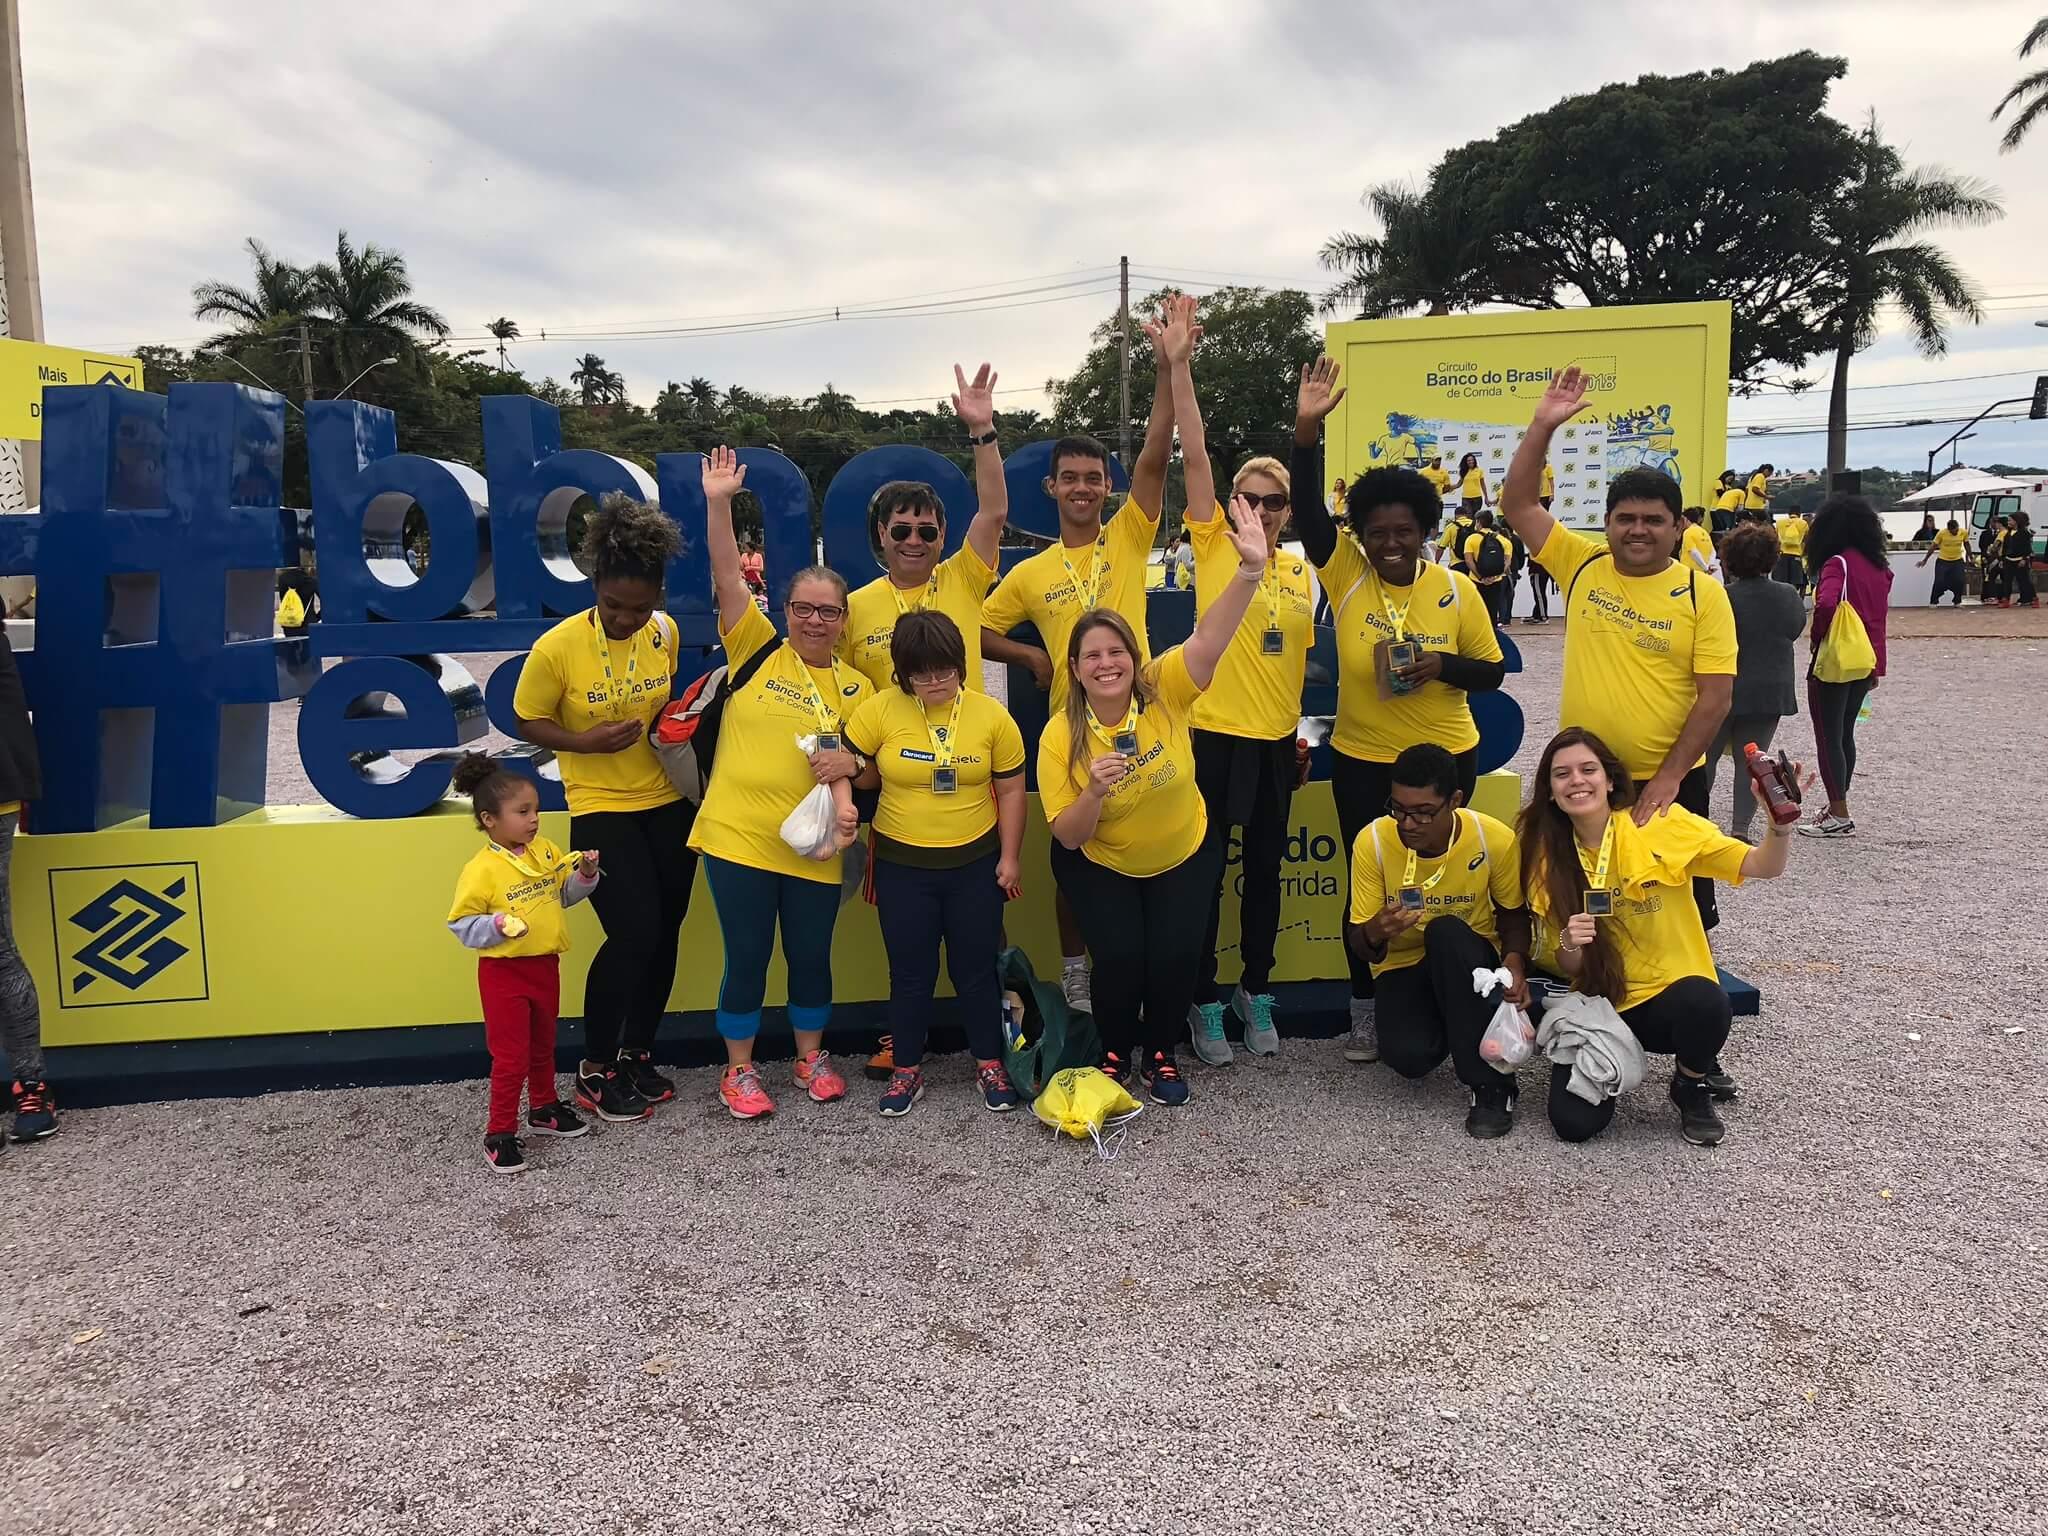 Circuito Banco Do Brasil : Apabb mg participa do circuito banco do brasil núcleo regional